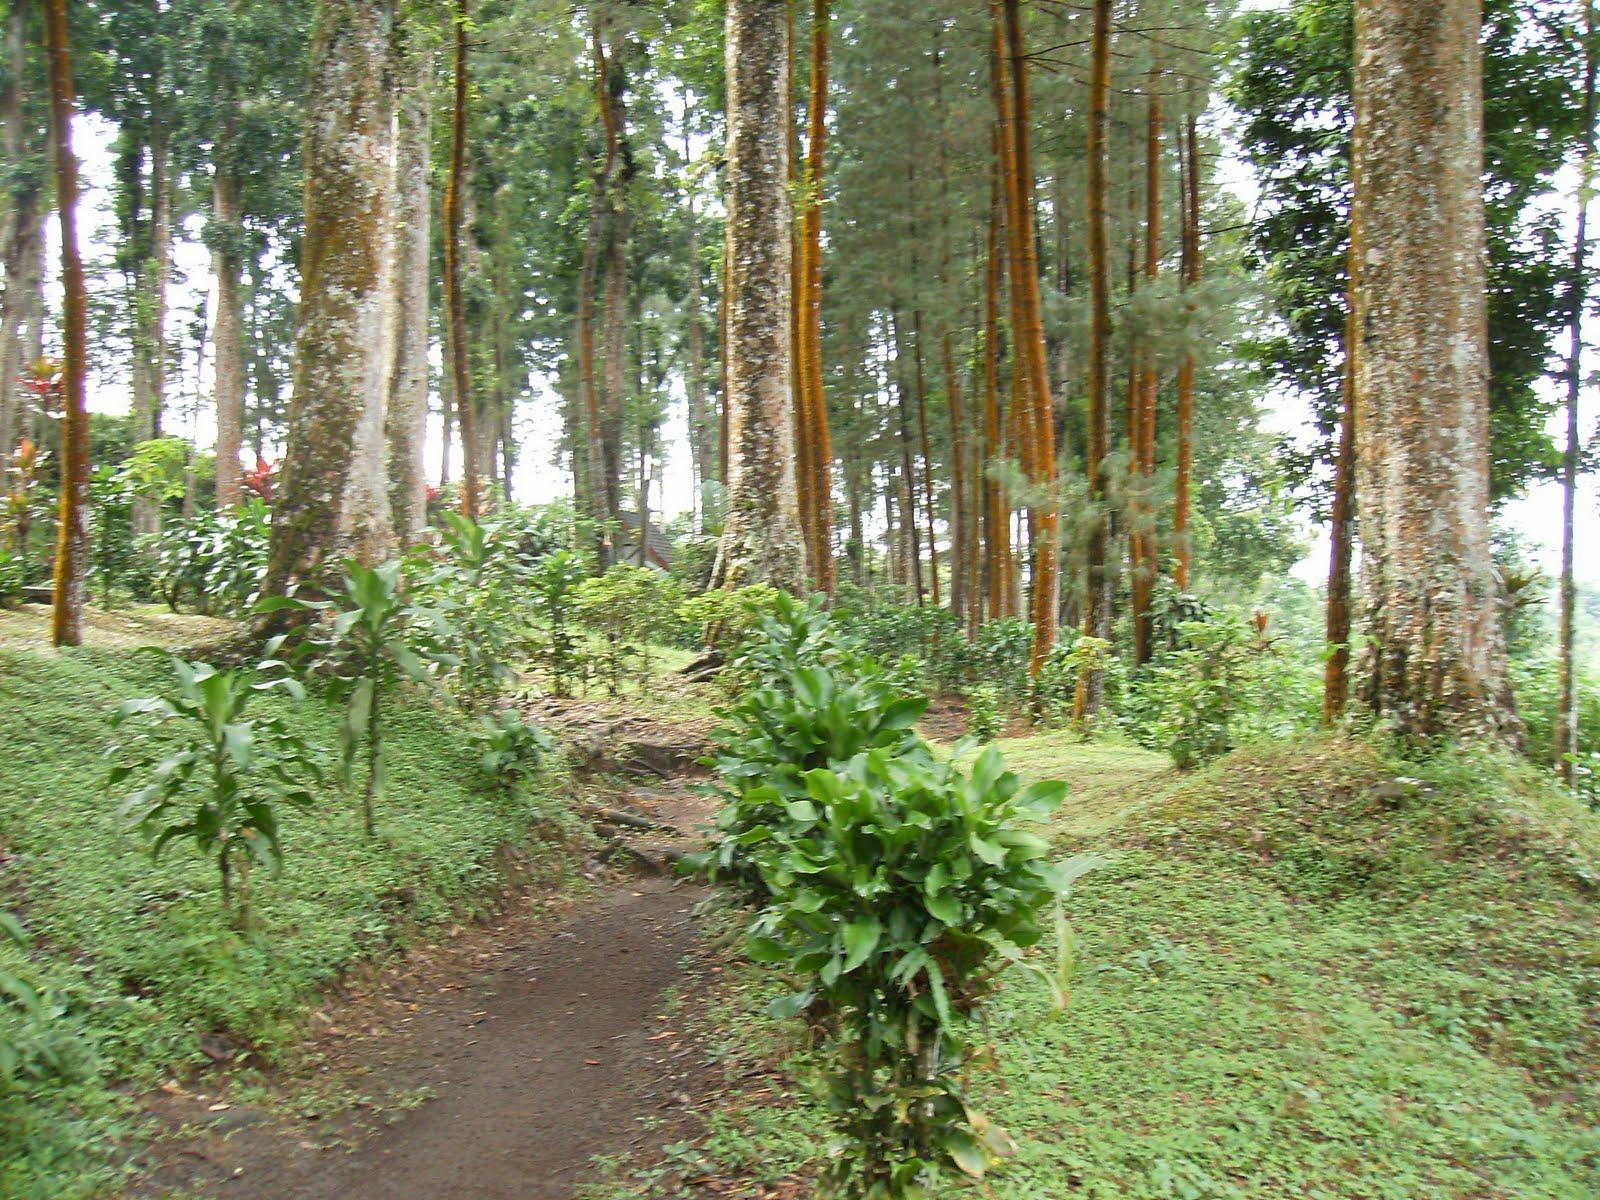 Objek Wisata Purwokerto Pariwisata Indonesia